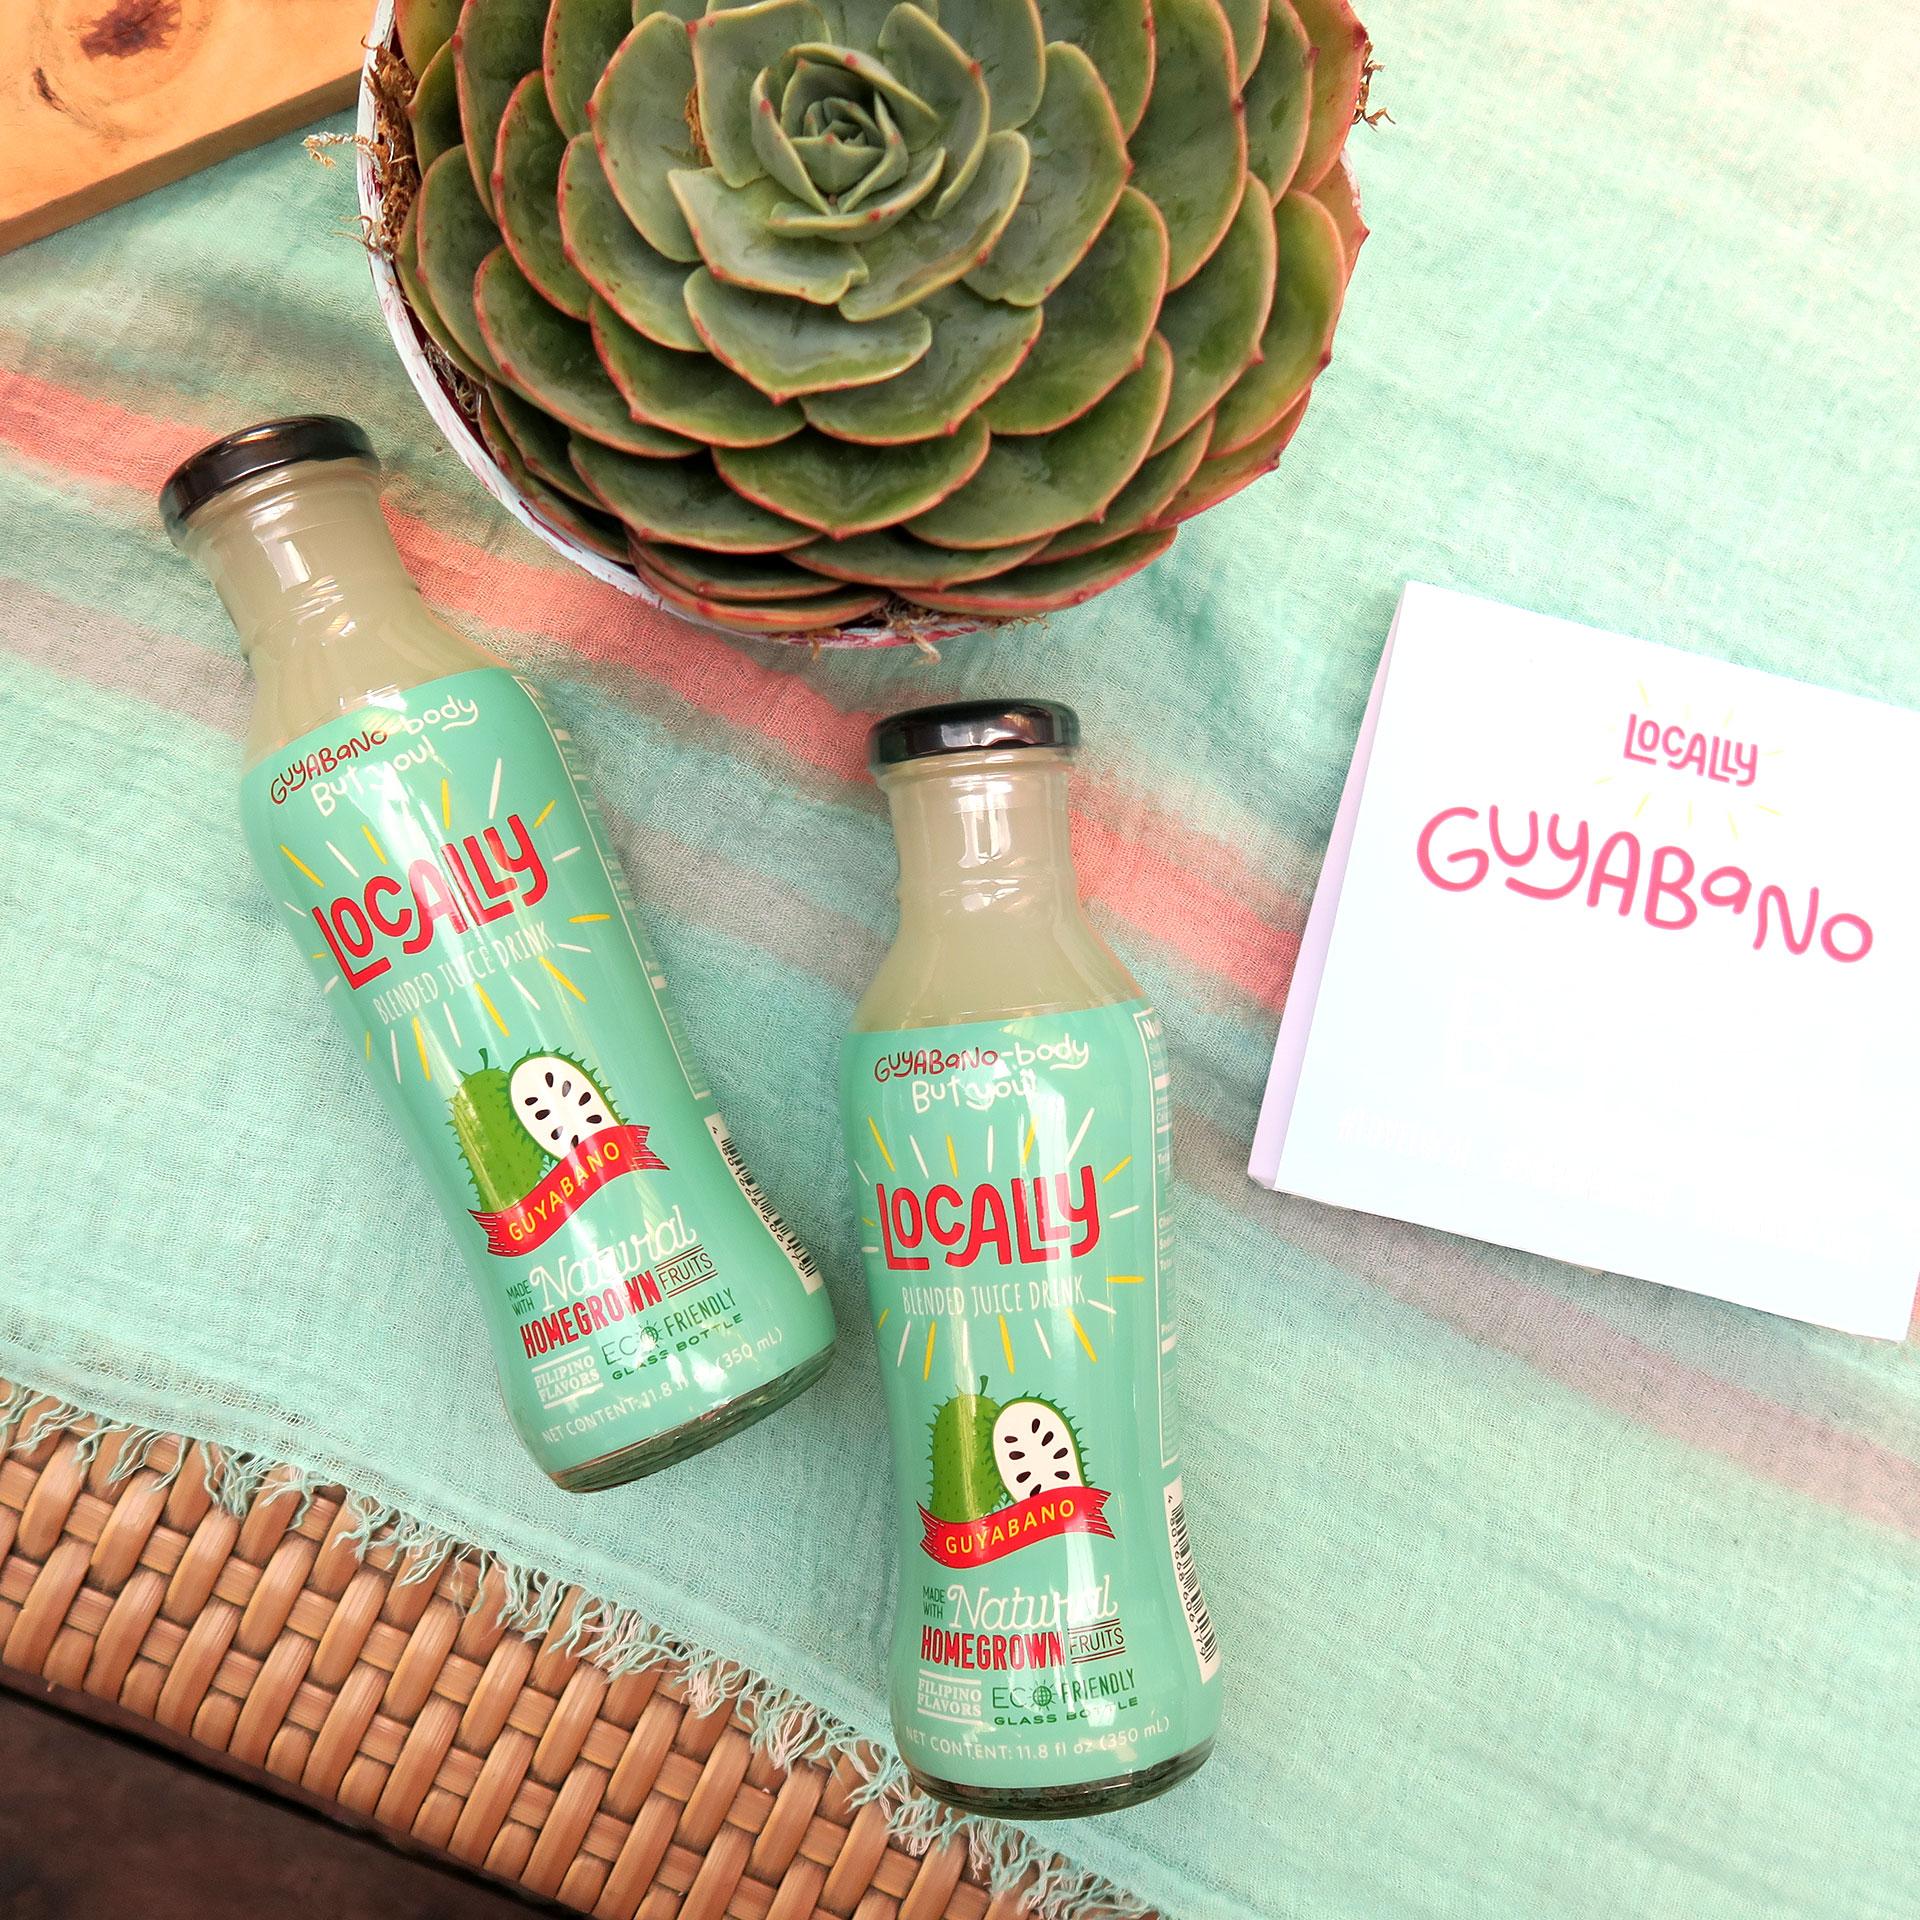 5 Locally Blended Juice Drink Review Photos - Gen-zel She Sings Beauty